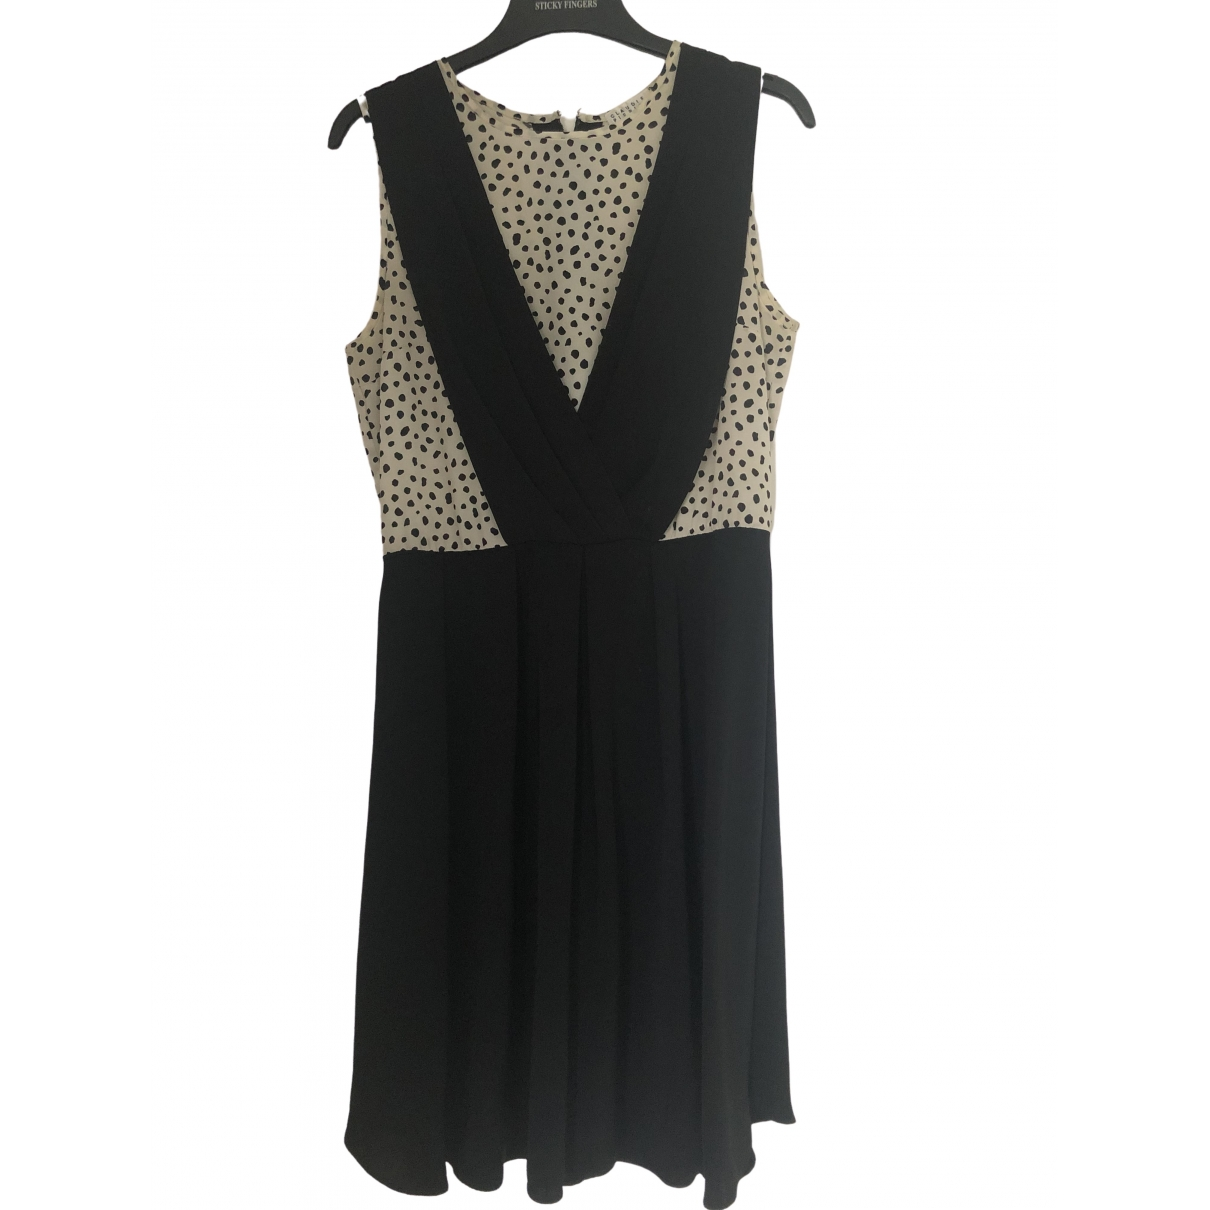 Claudie Pierlot \N Black Silk dress for Women 36 FR